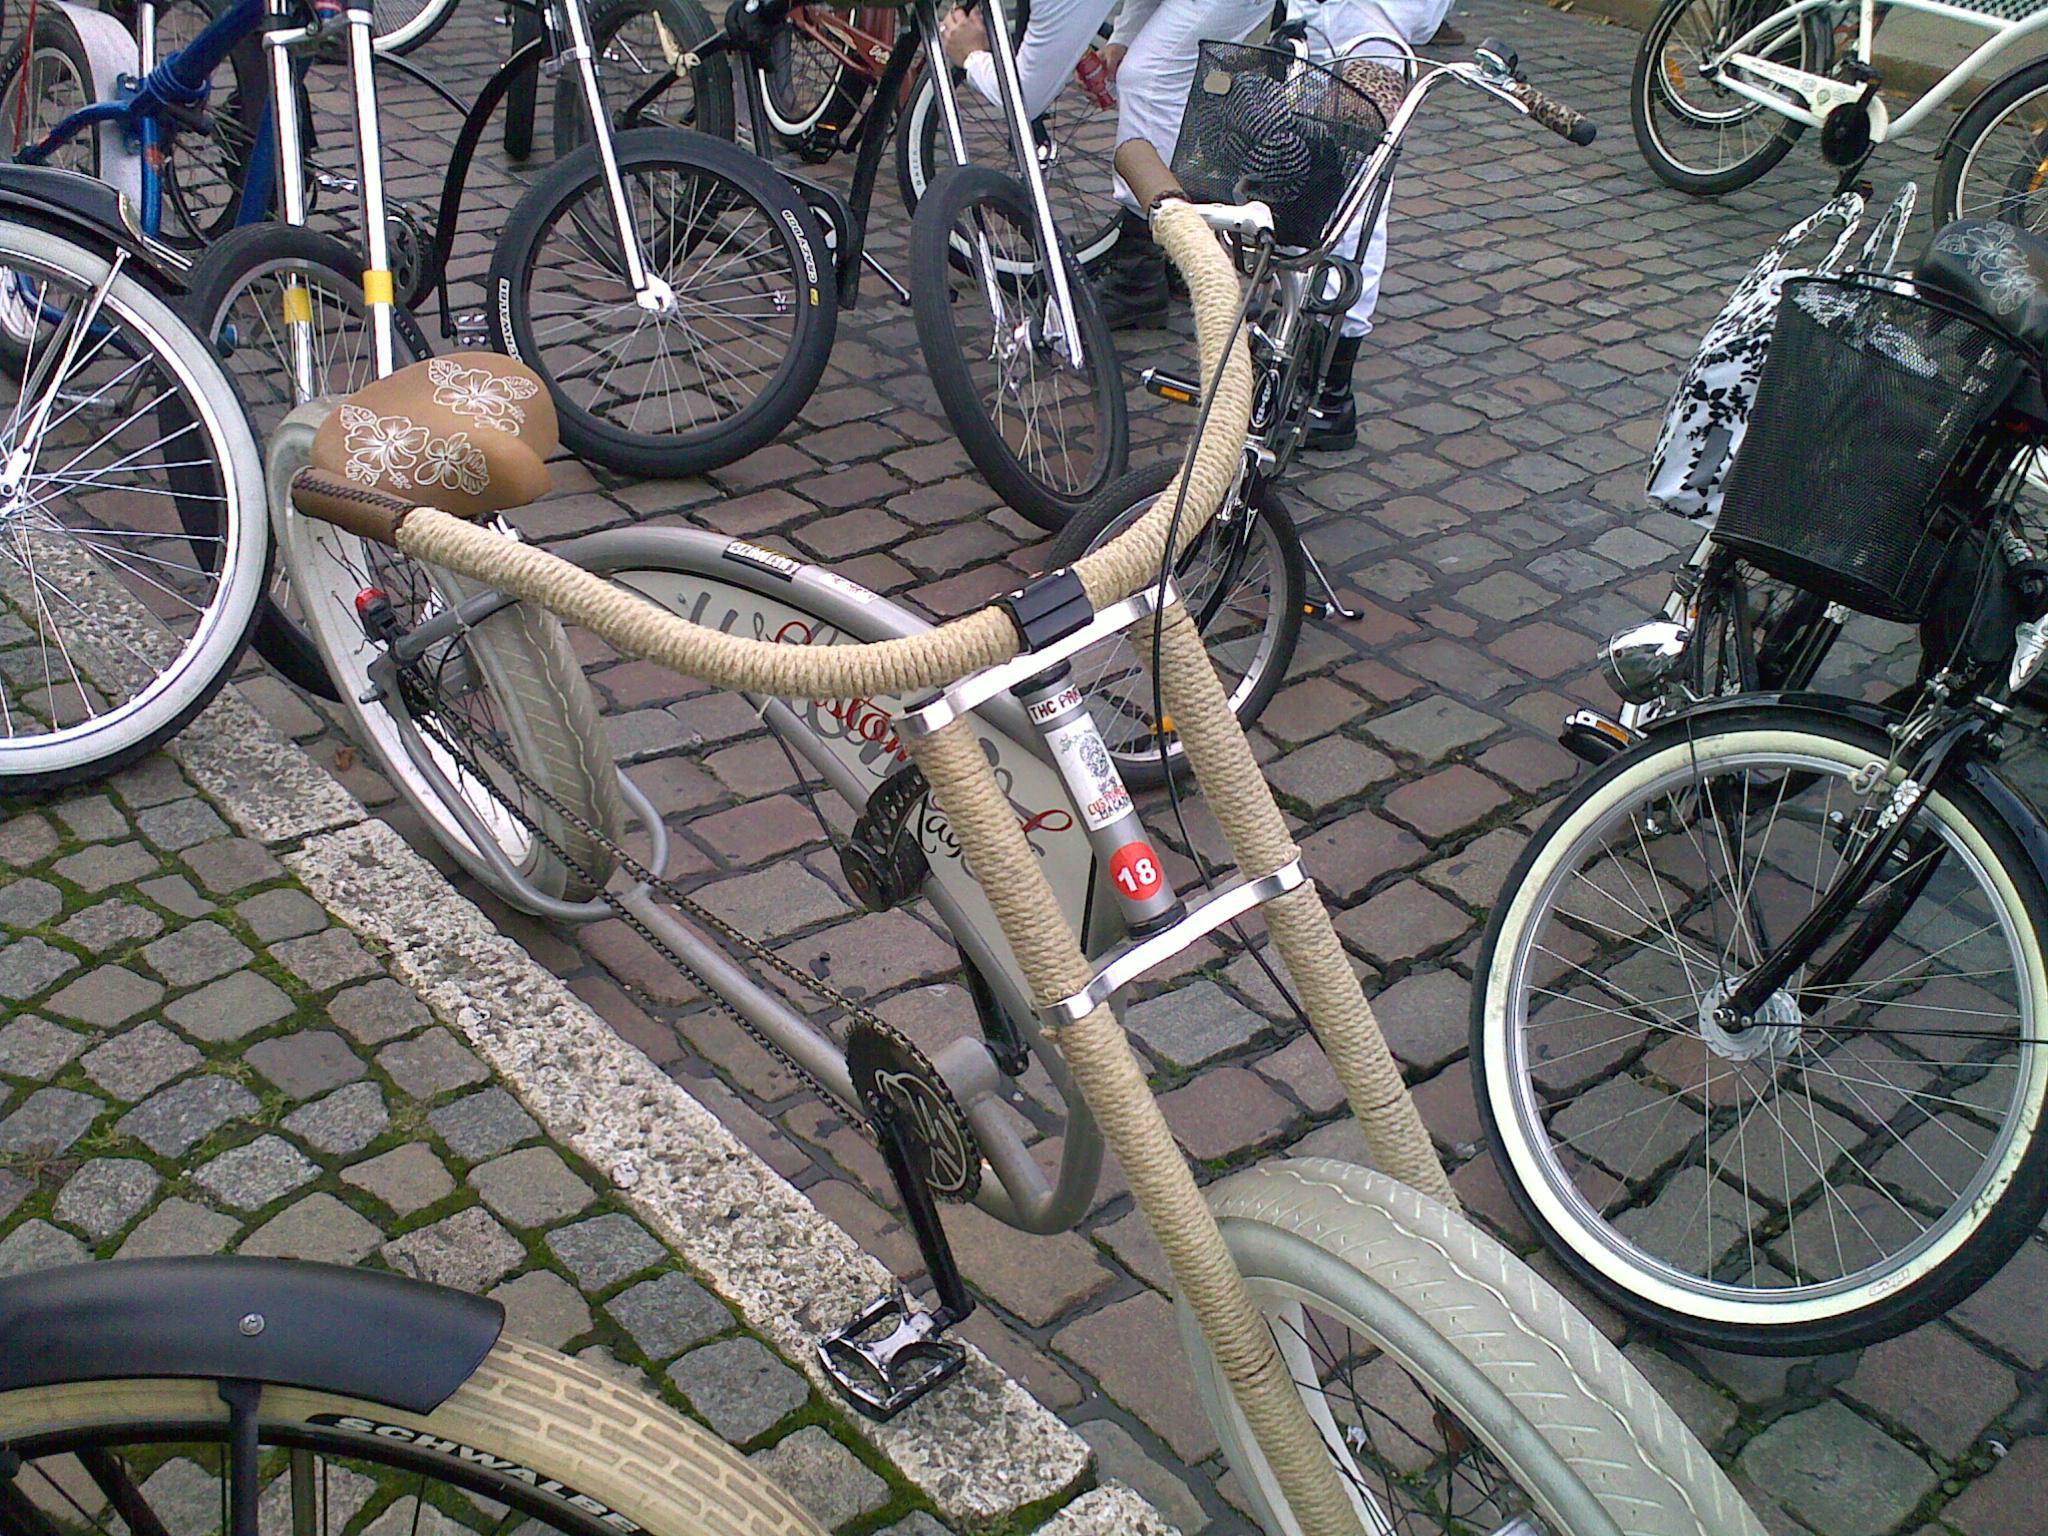 wickellenker_halloweencruise2009-hamburg_radpropaganda